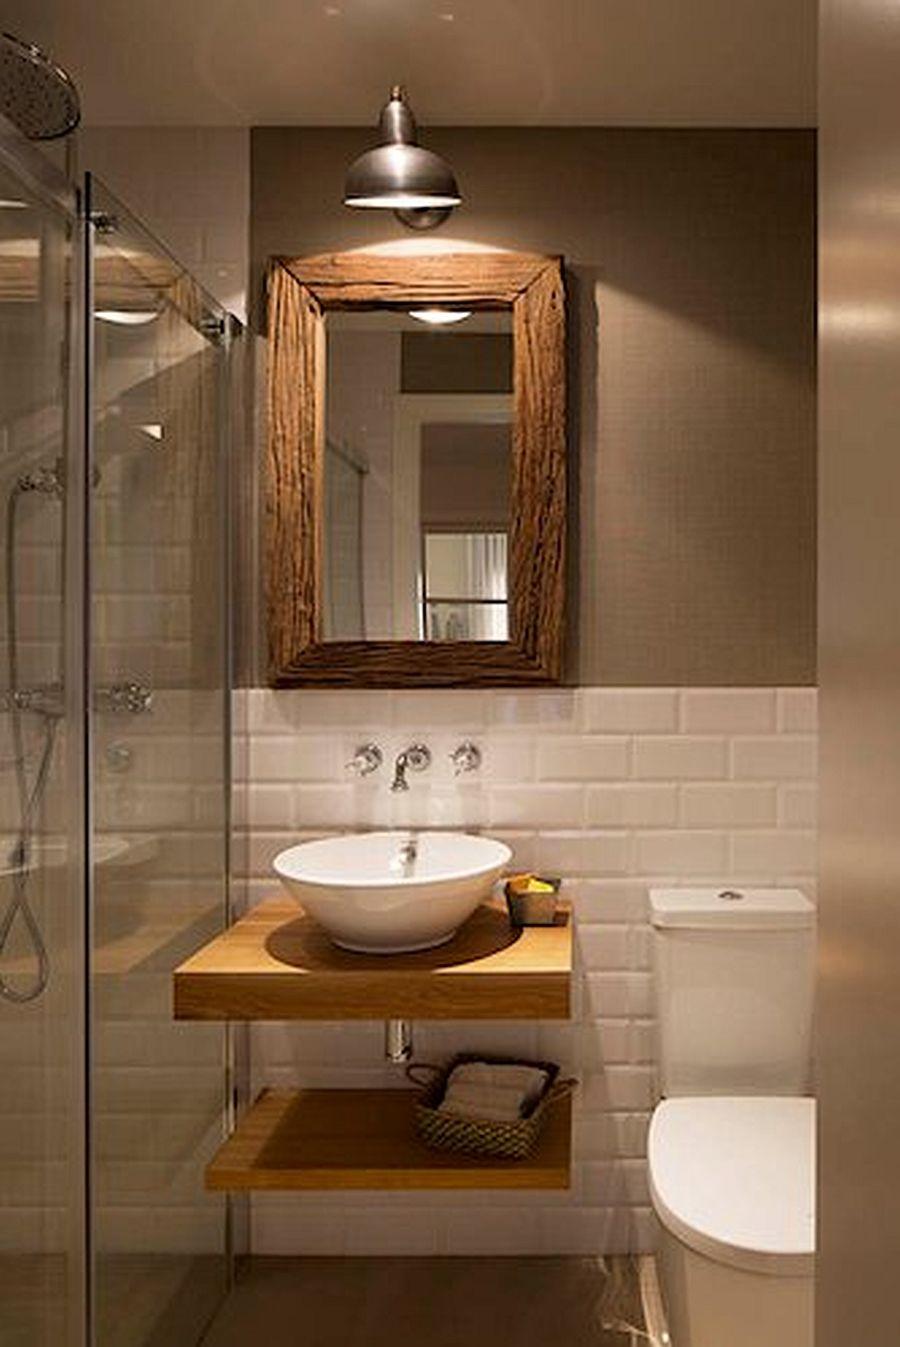 adelaparvu.com despre renovare apartament in cladire veche, casa Barcelona, designer Meritxell Ribe (27)